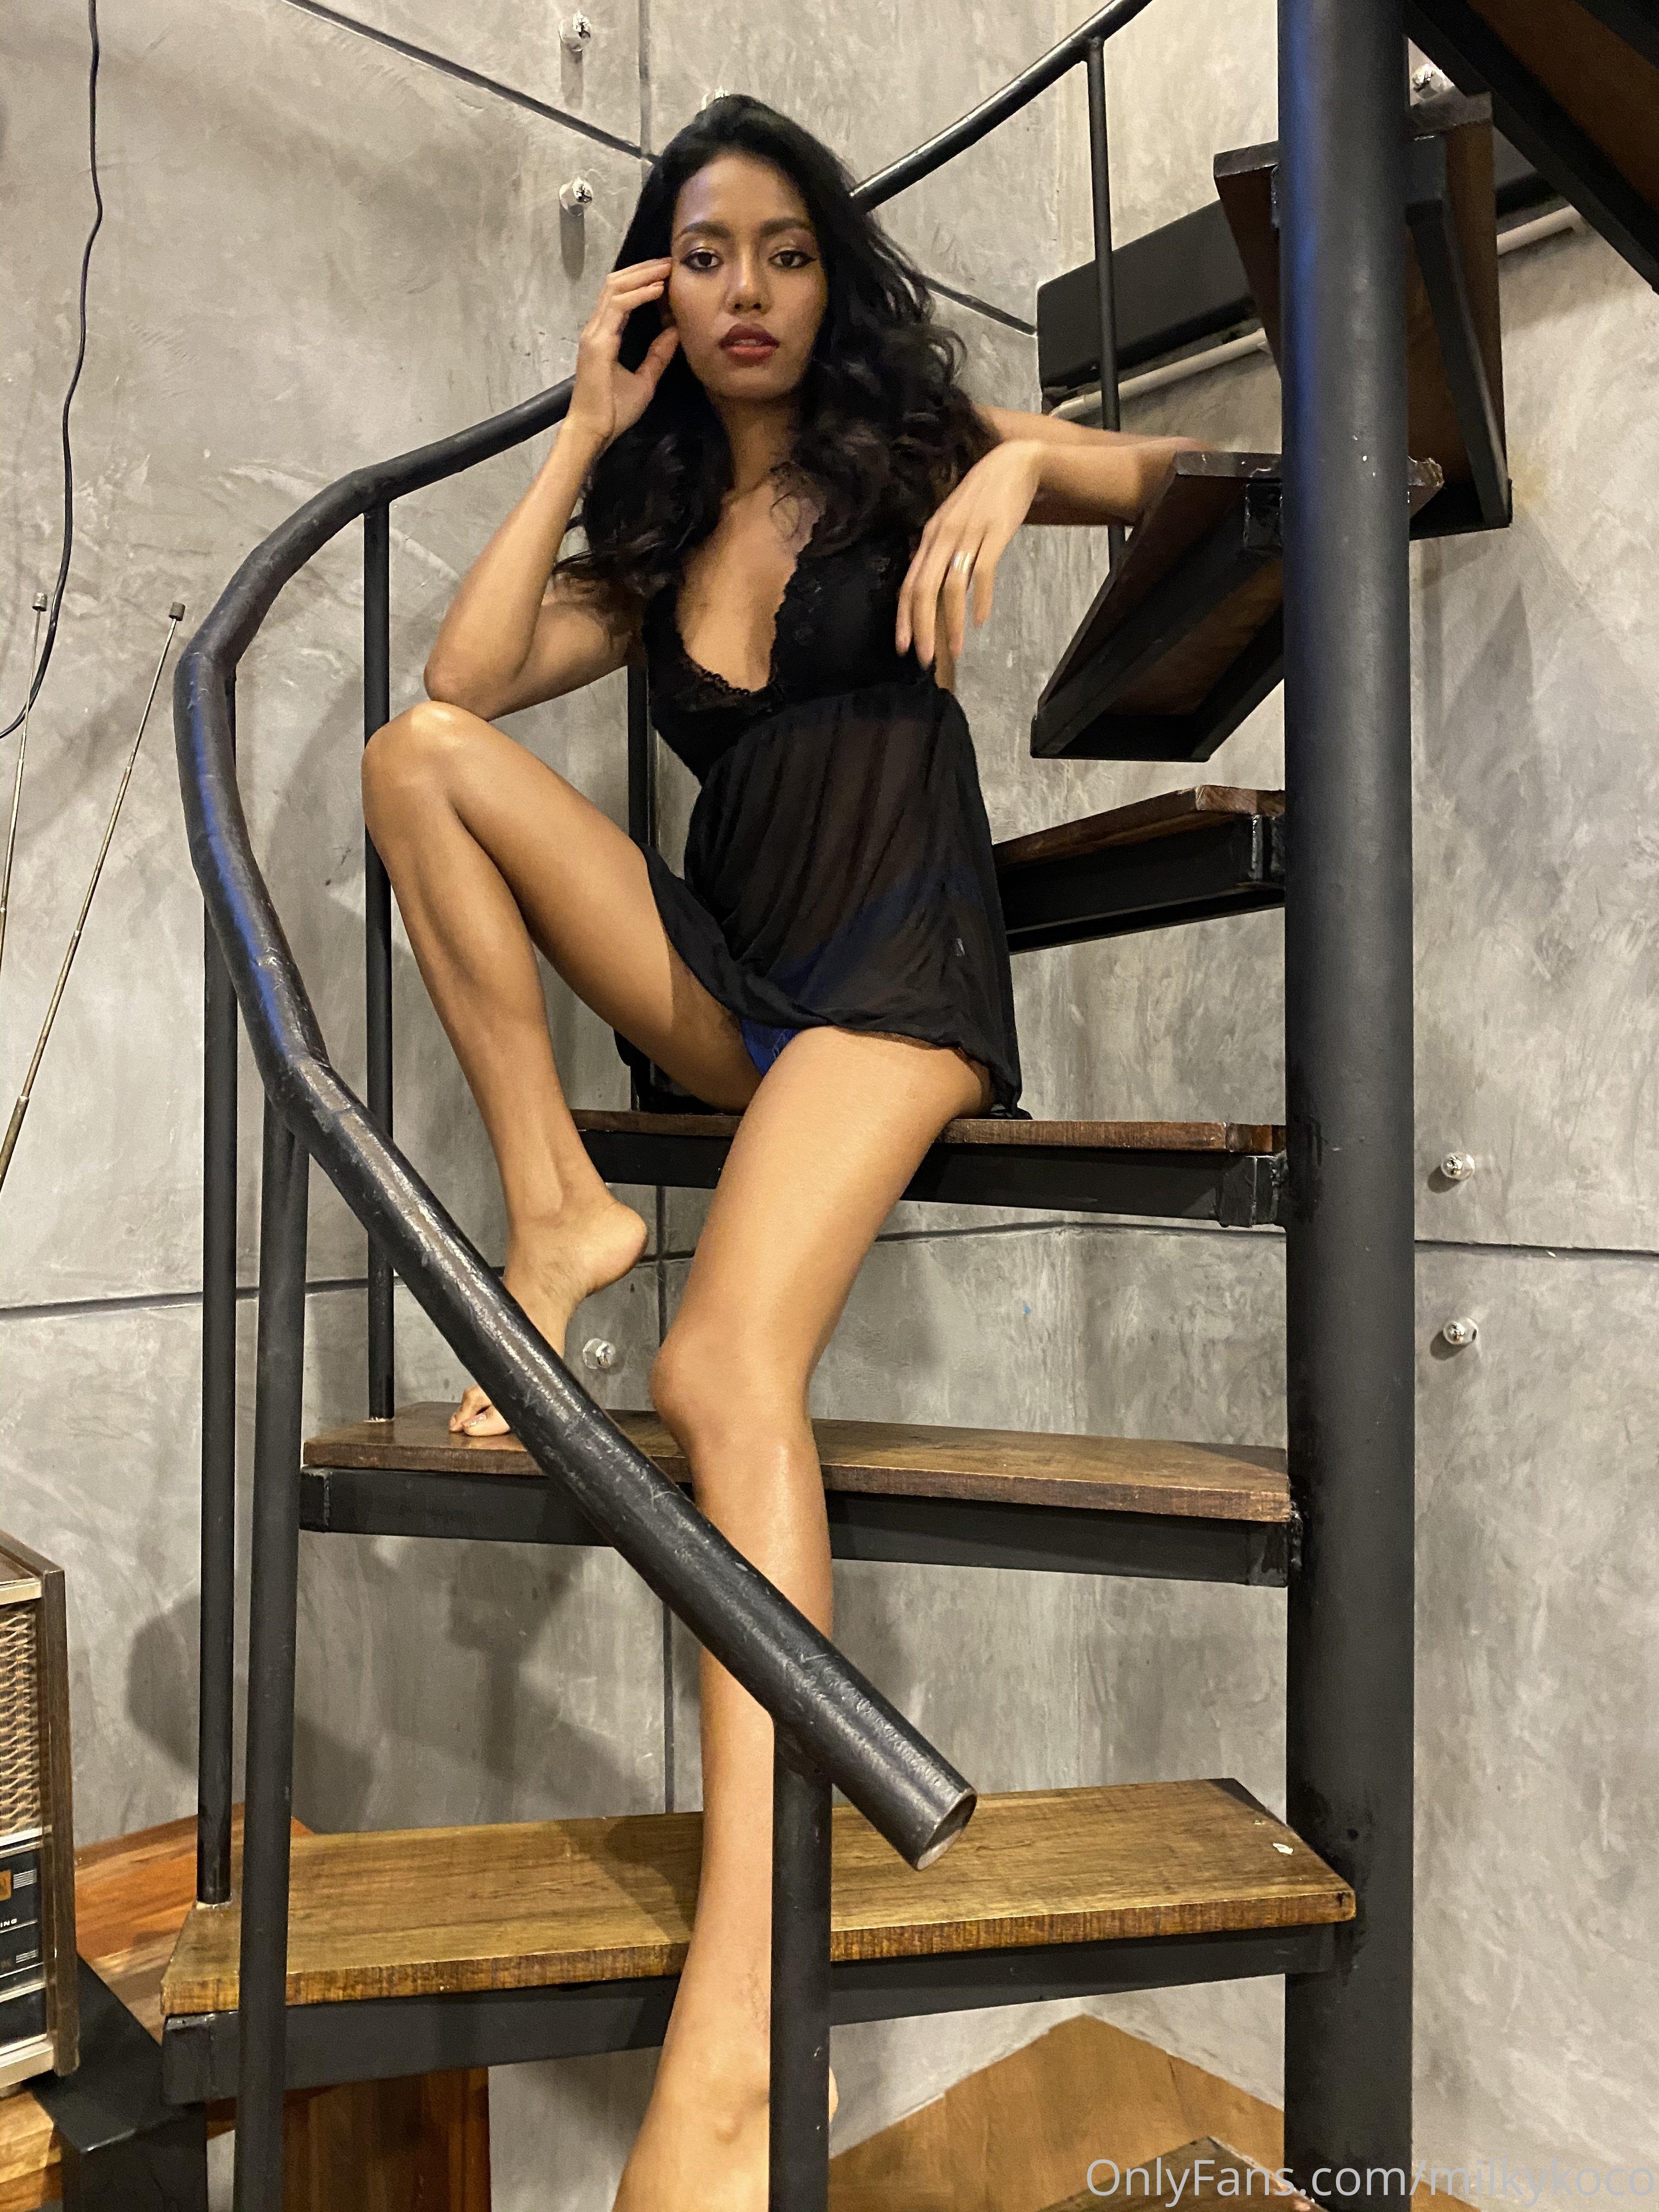 Koko Mylk Bangkok Model Leaked Onlyfans 0058